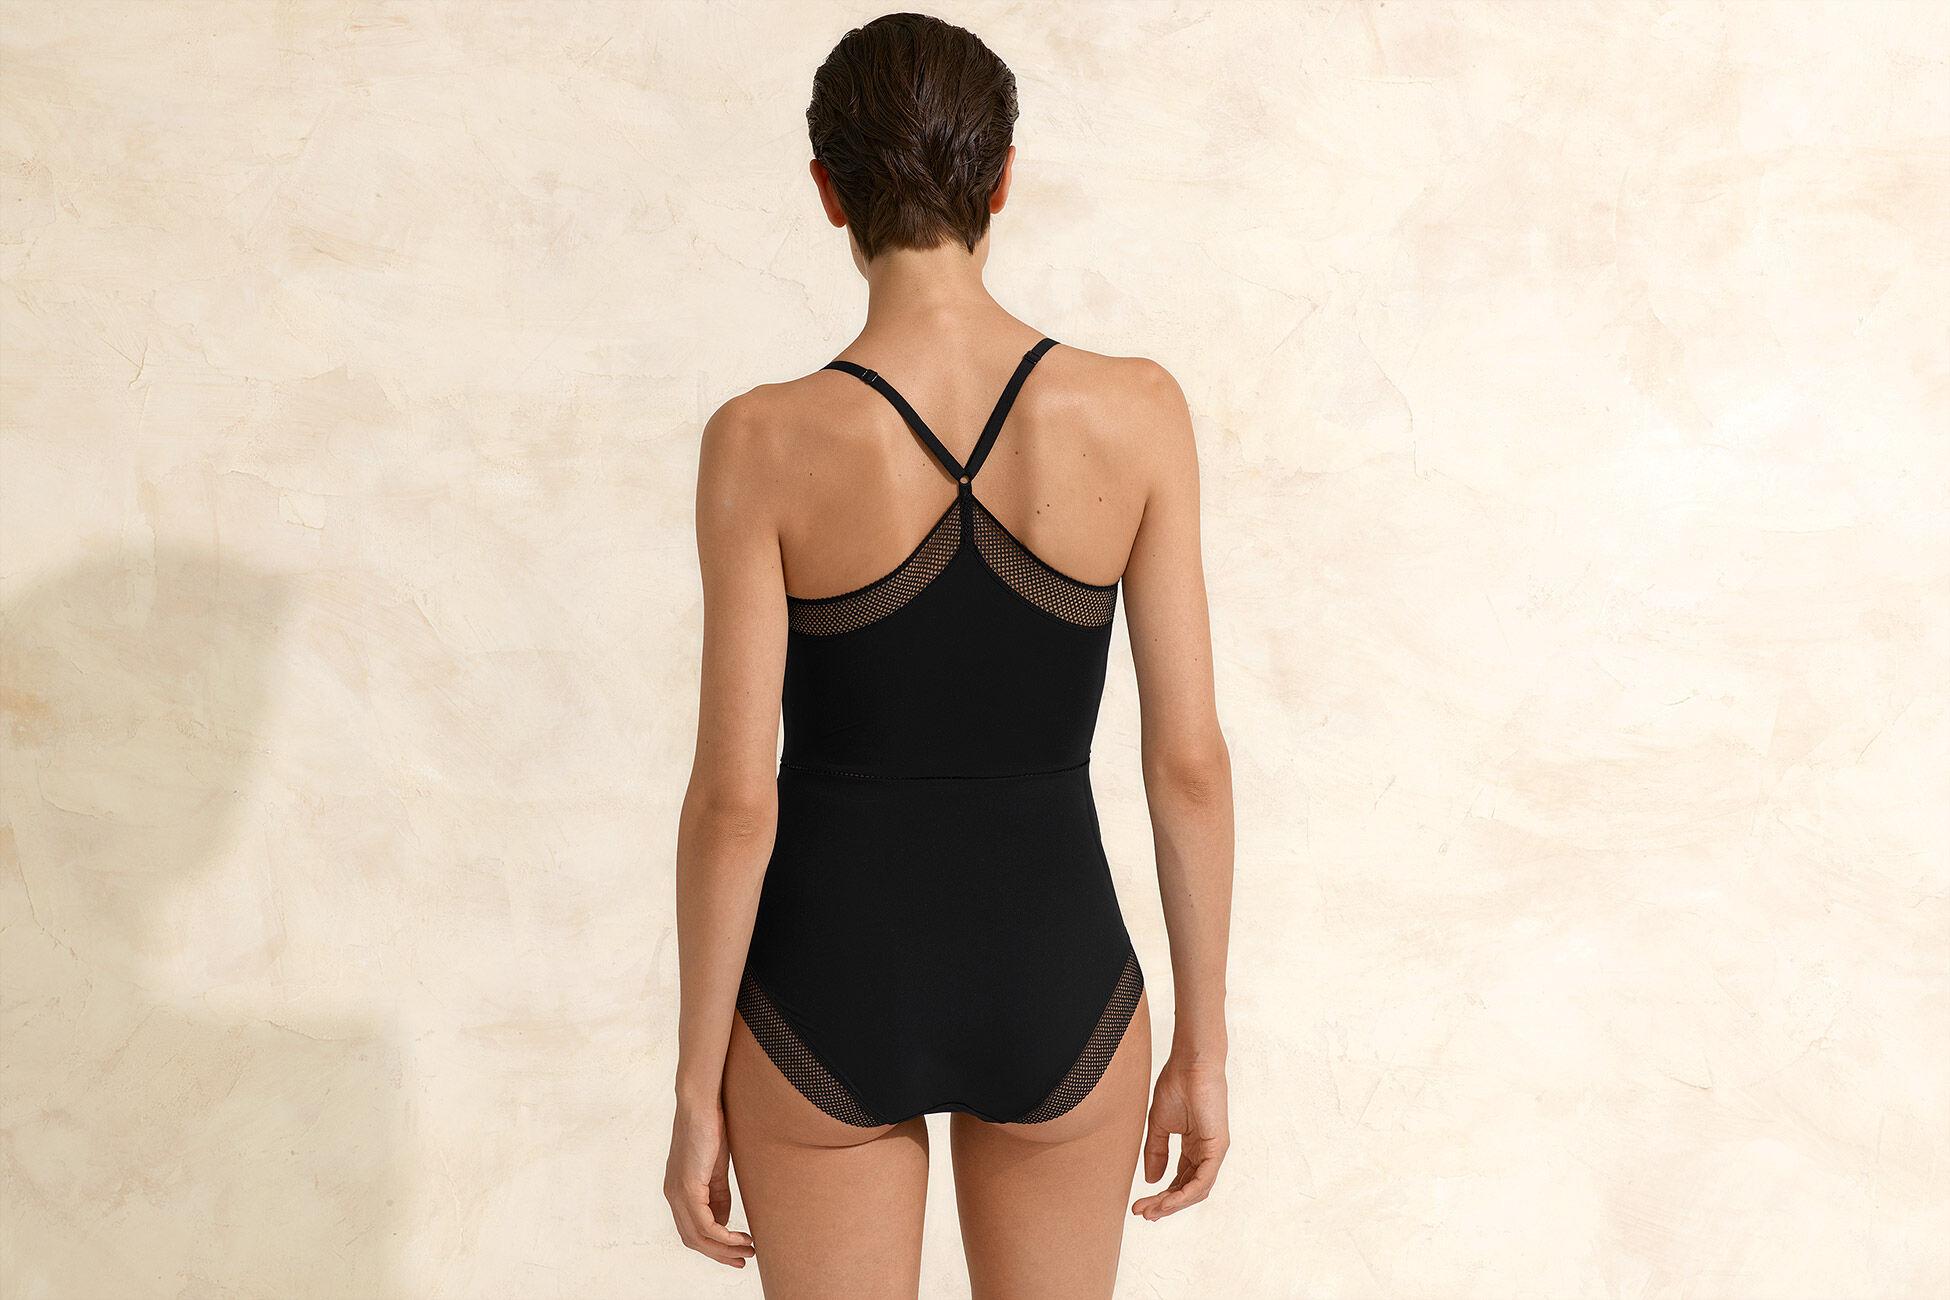 Olympie Body standard vista �